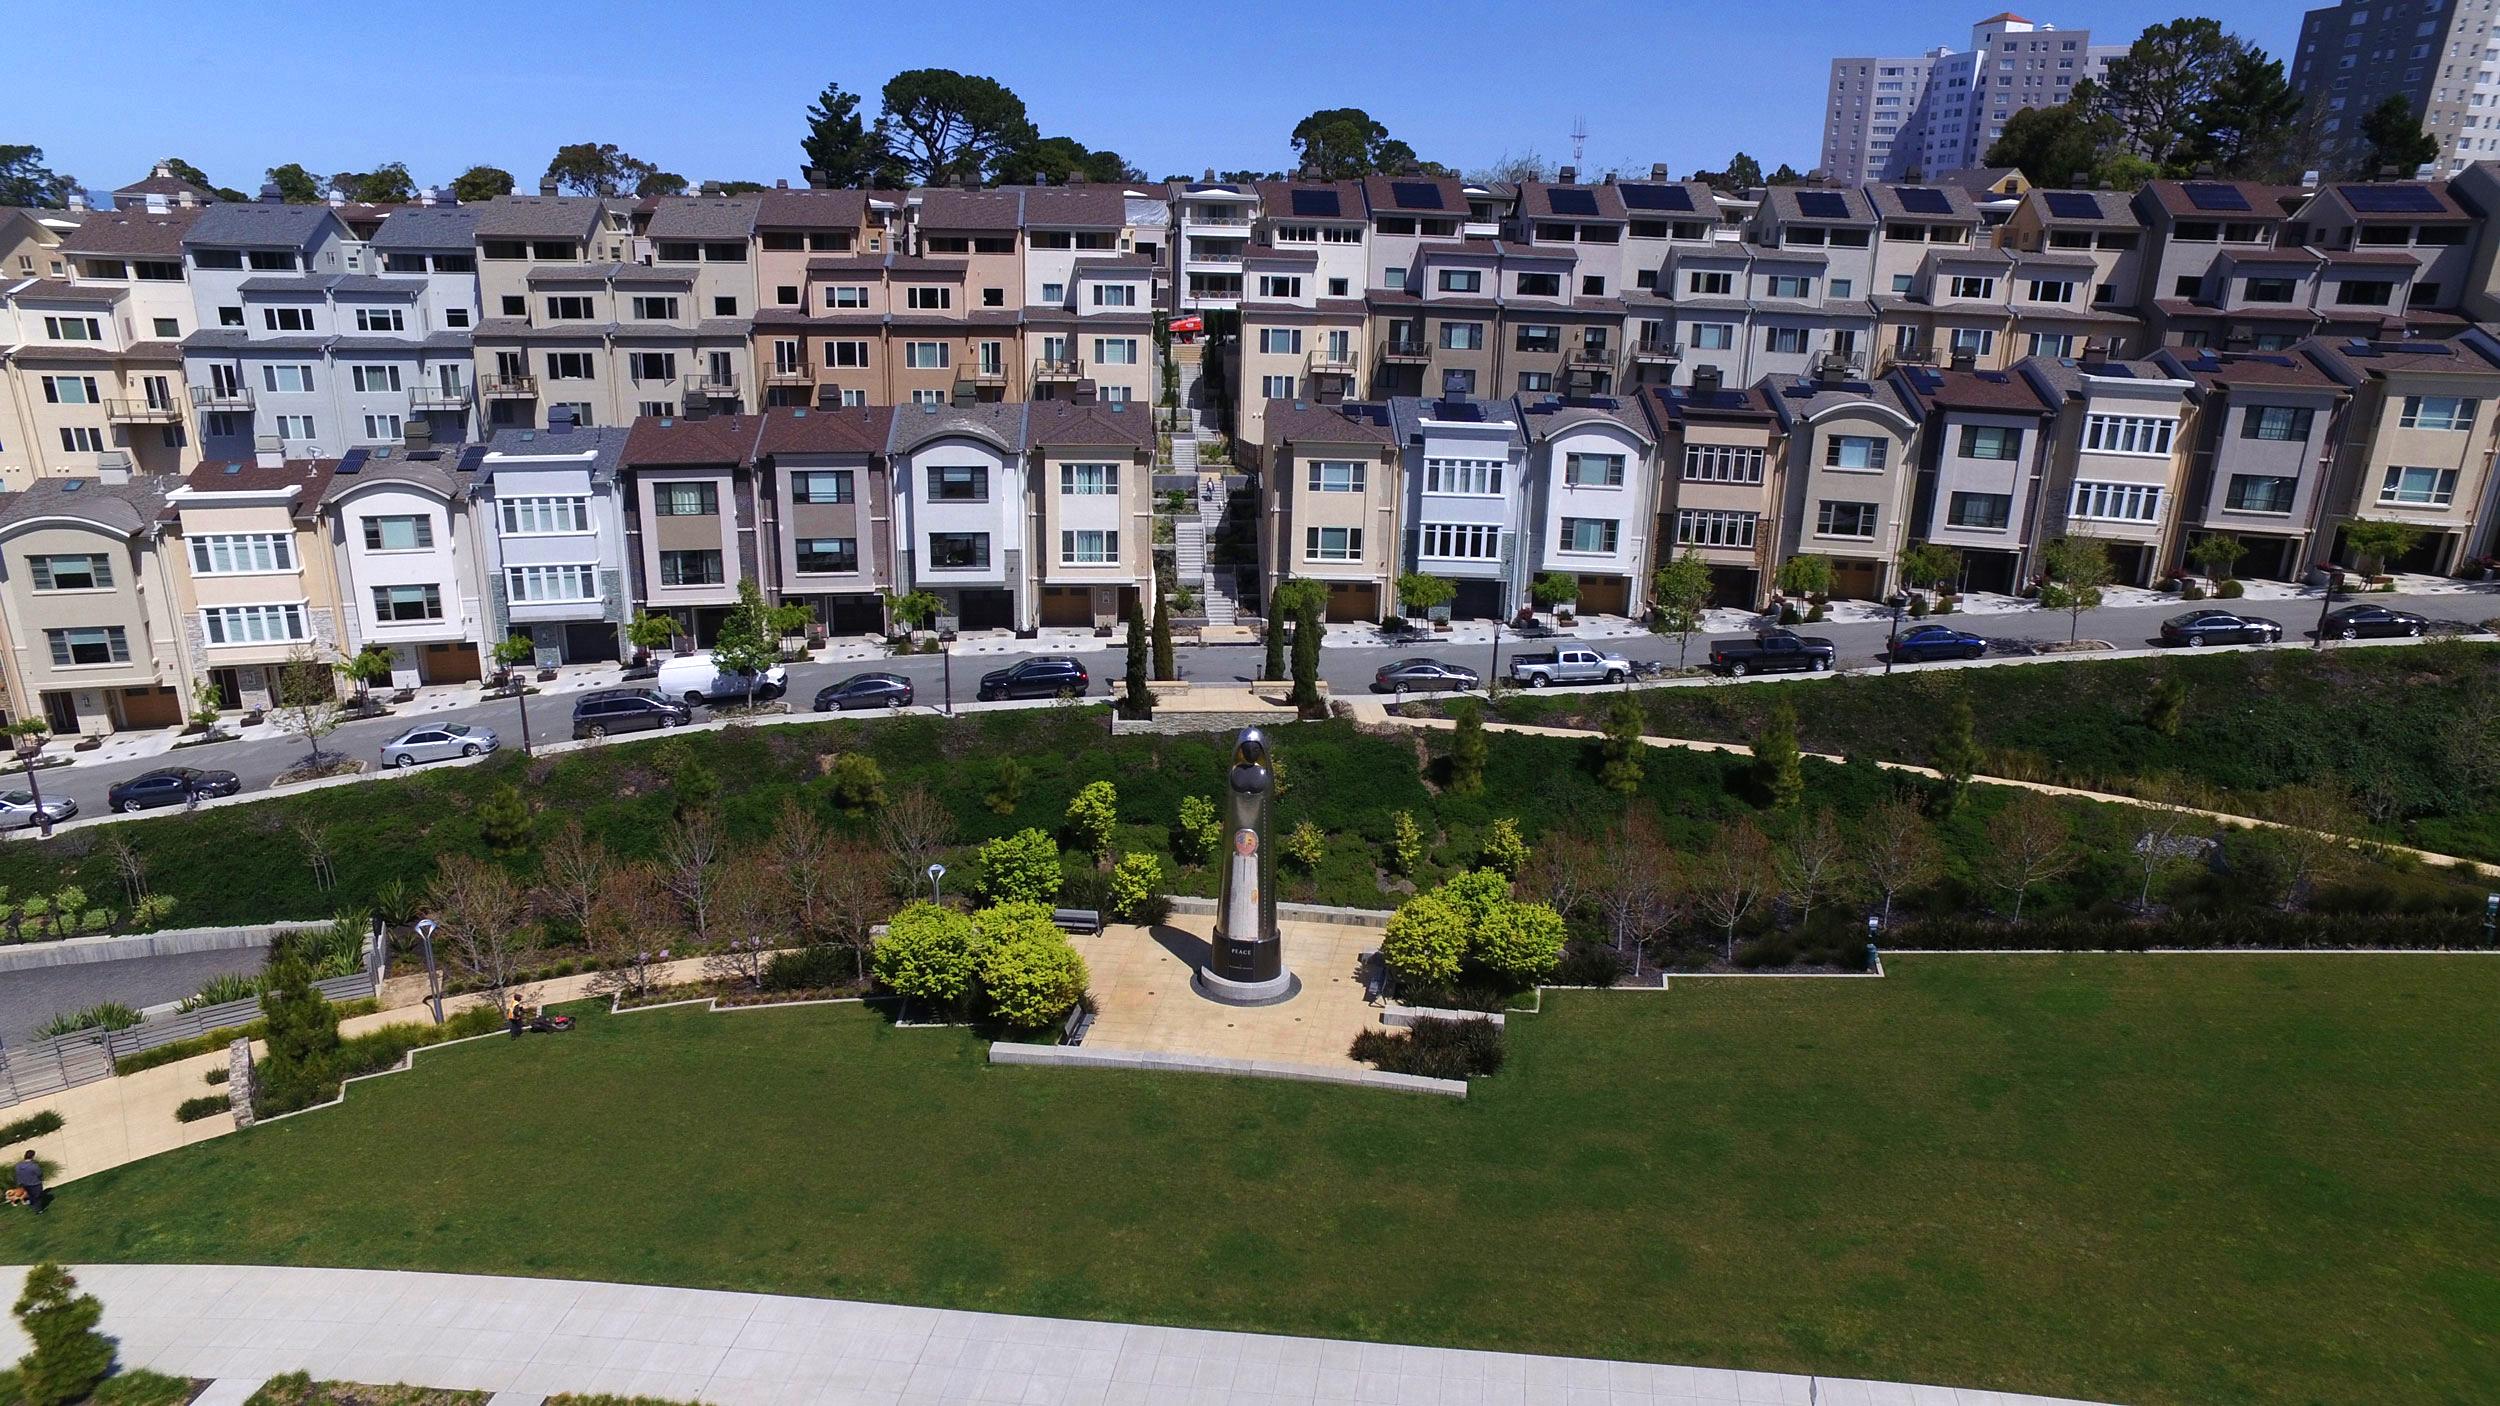 Summit-Park-Aerial-Photos-(4).jpg